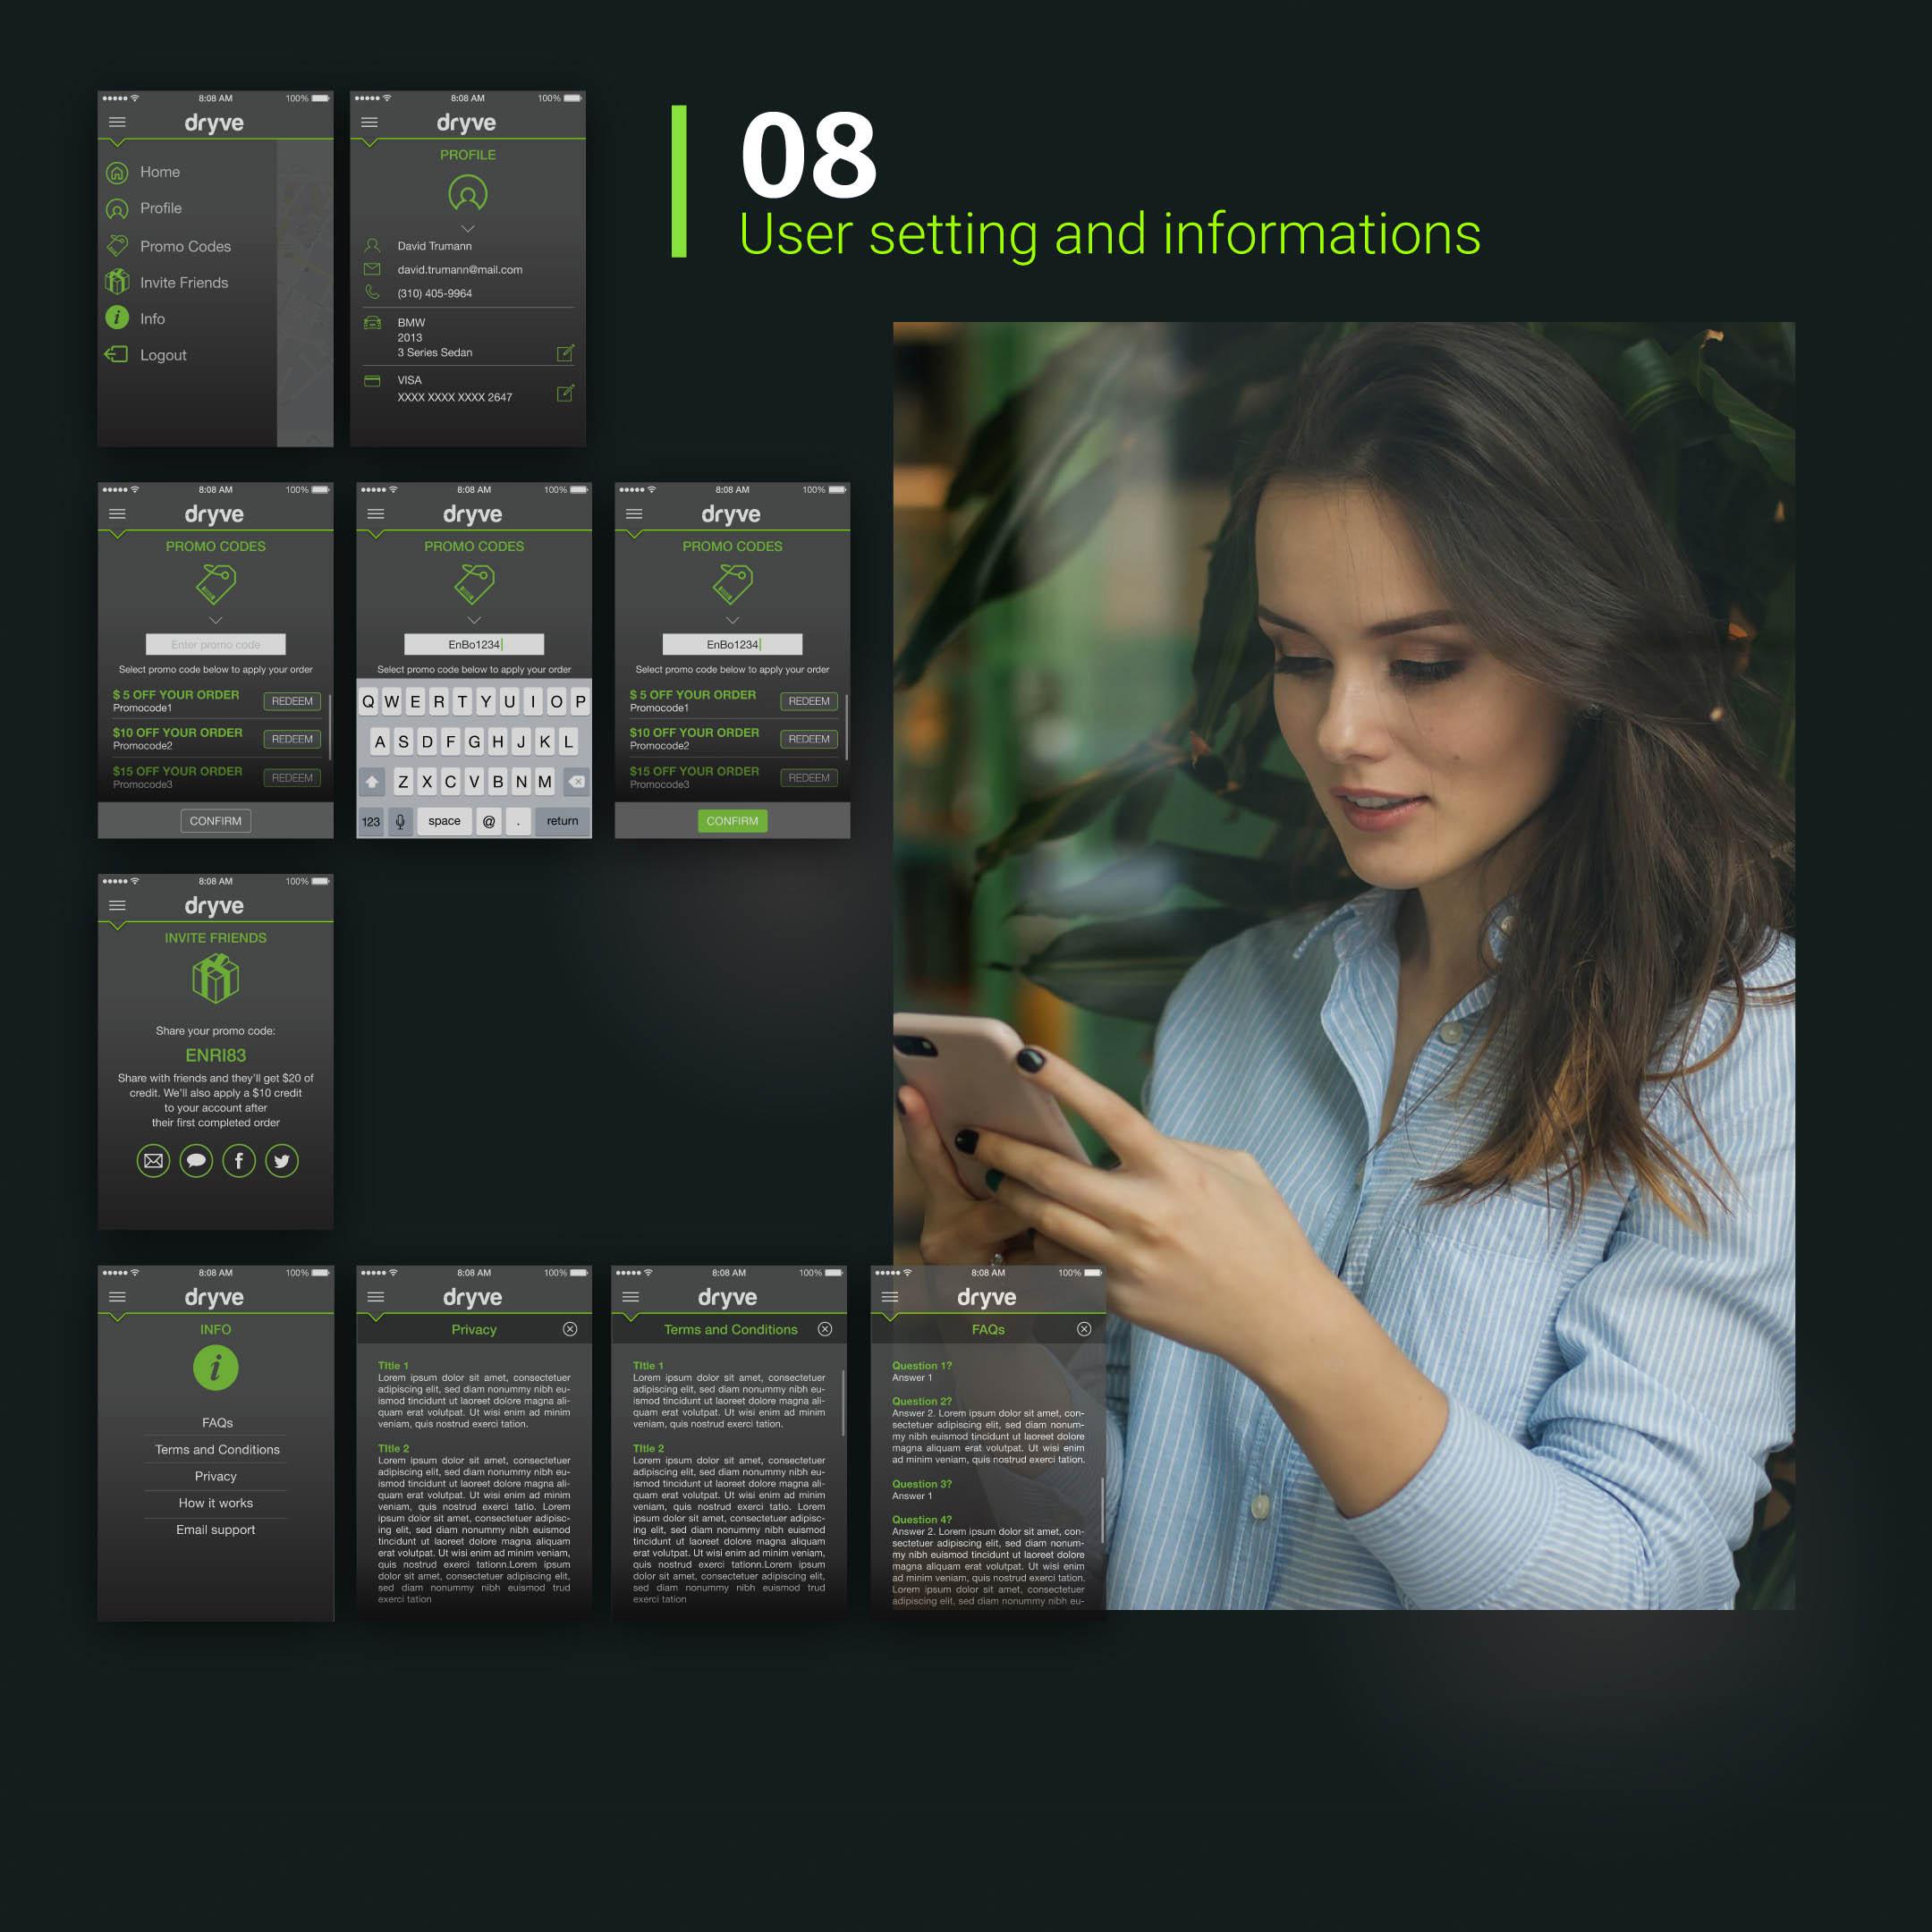 Dryve app Mockup BE Comunicazioni portfolio 08 R03